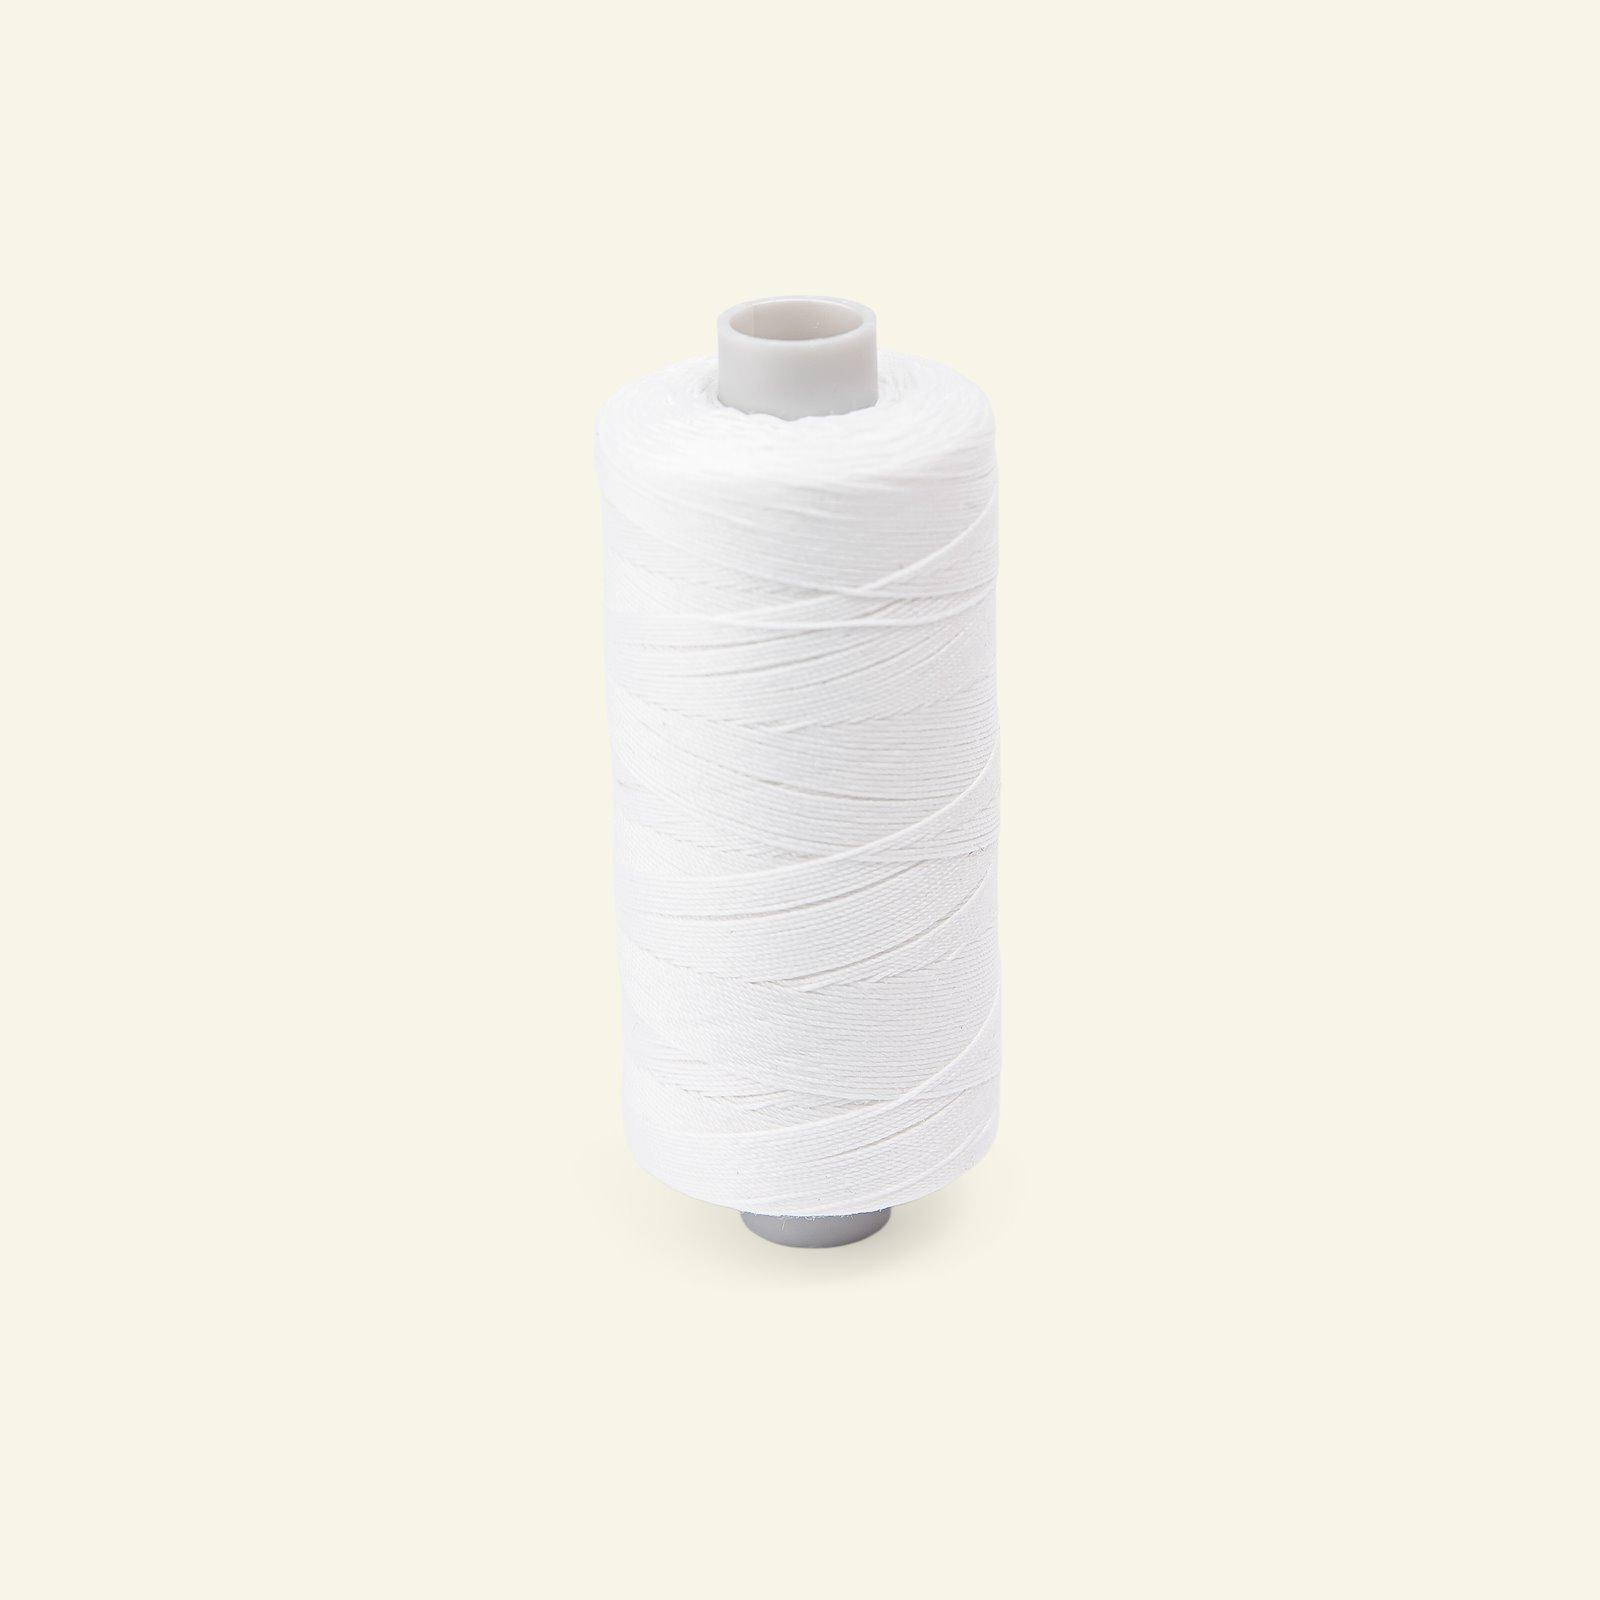 Upholstery thread white 300m 16001_pack